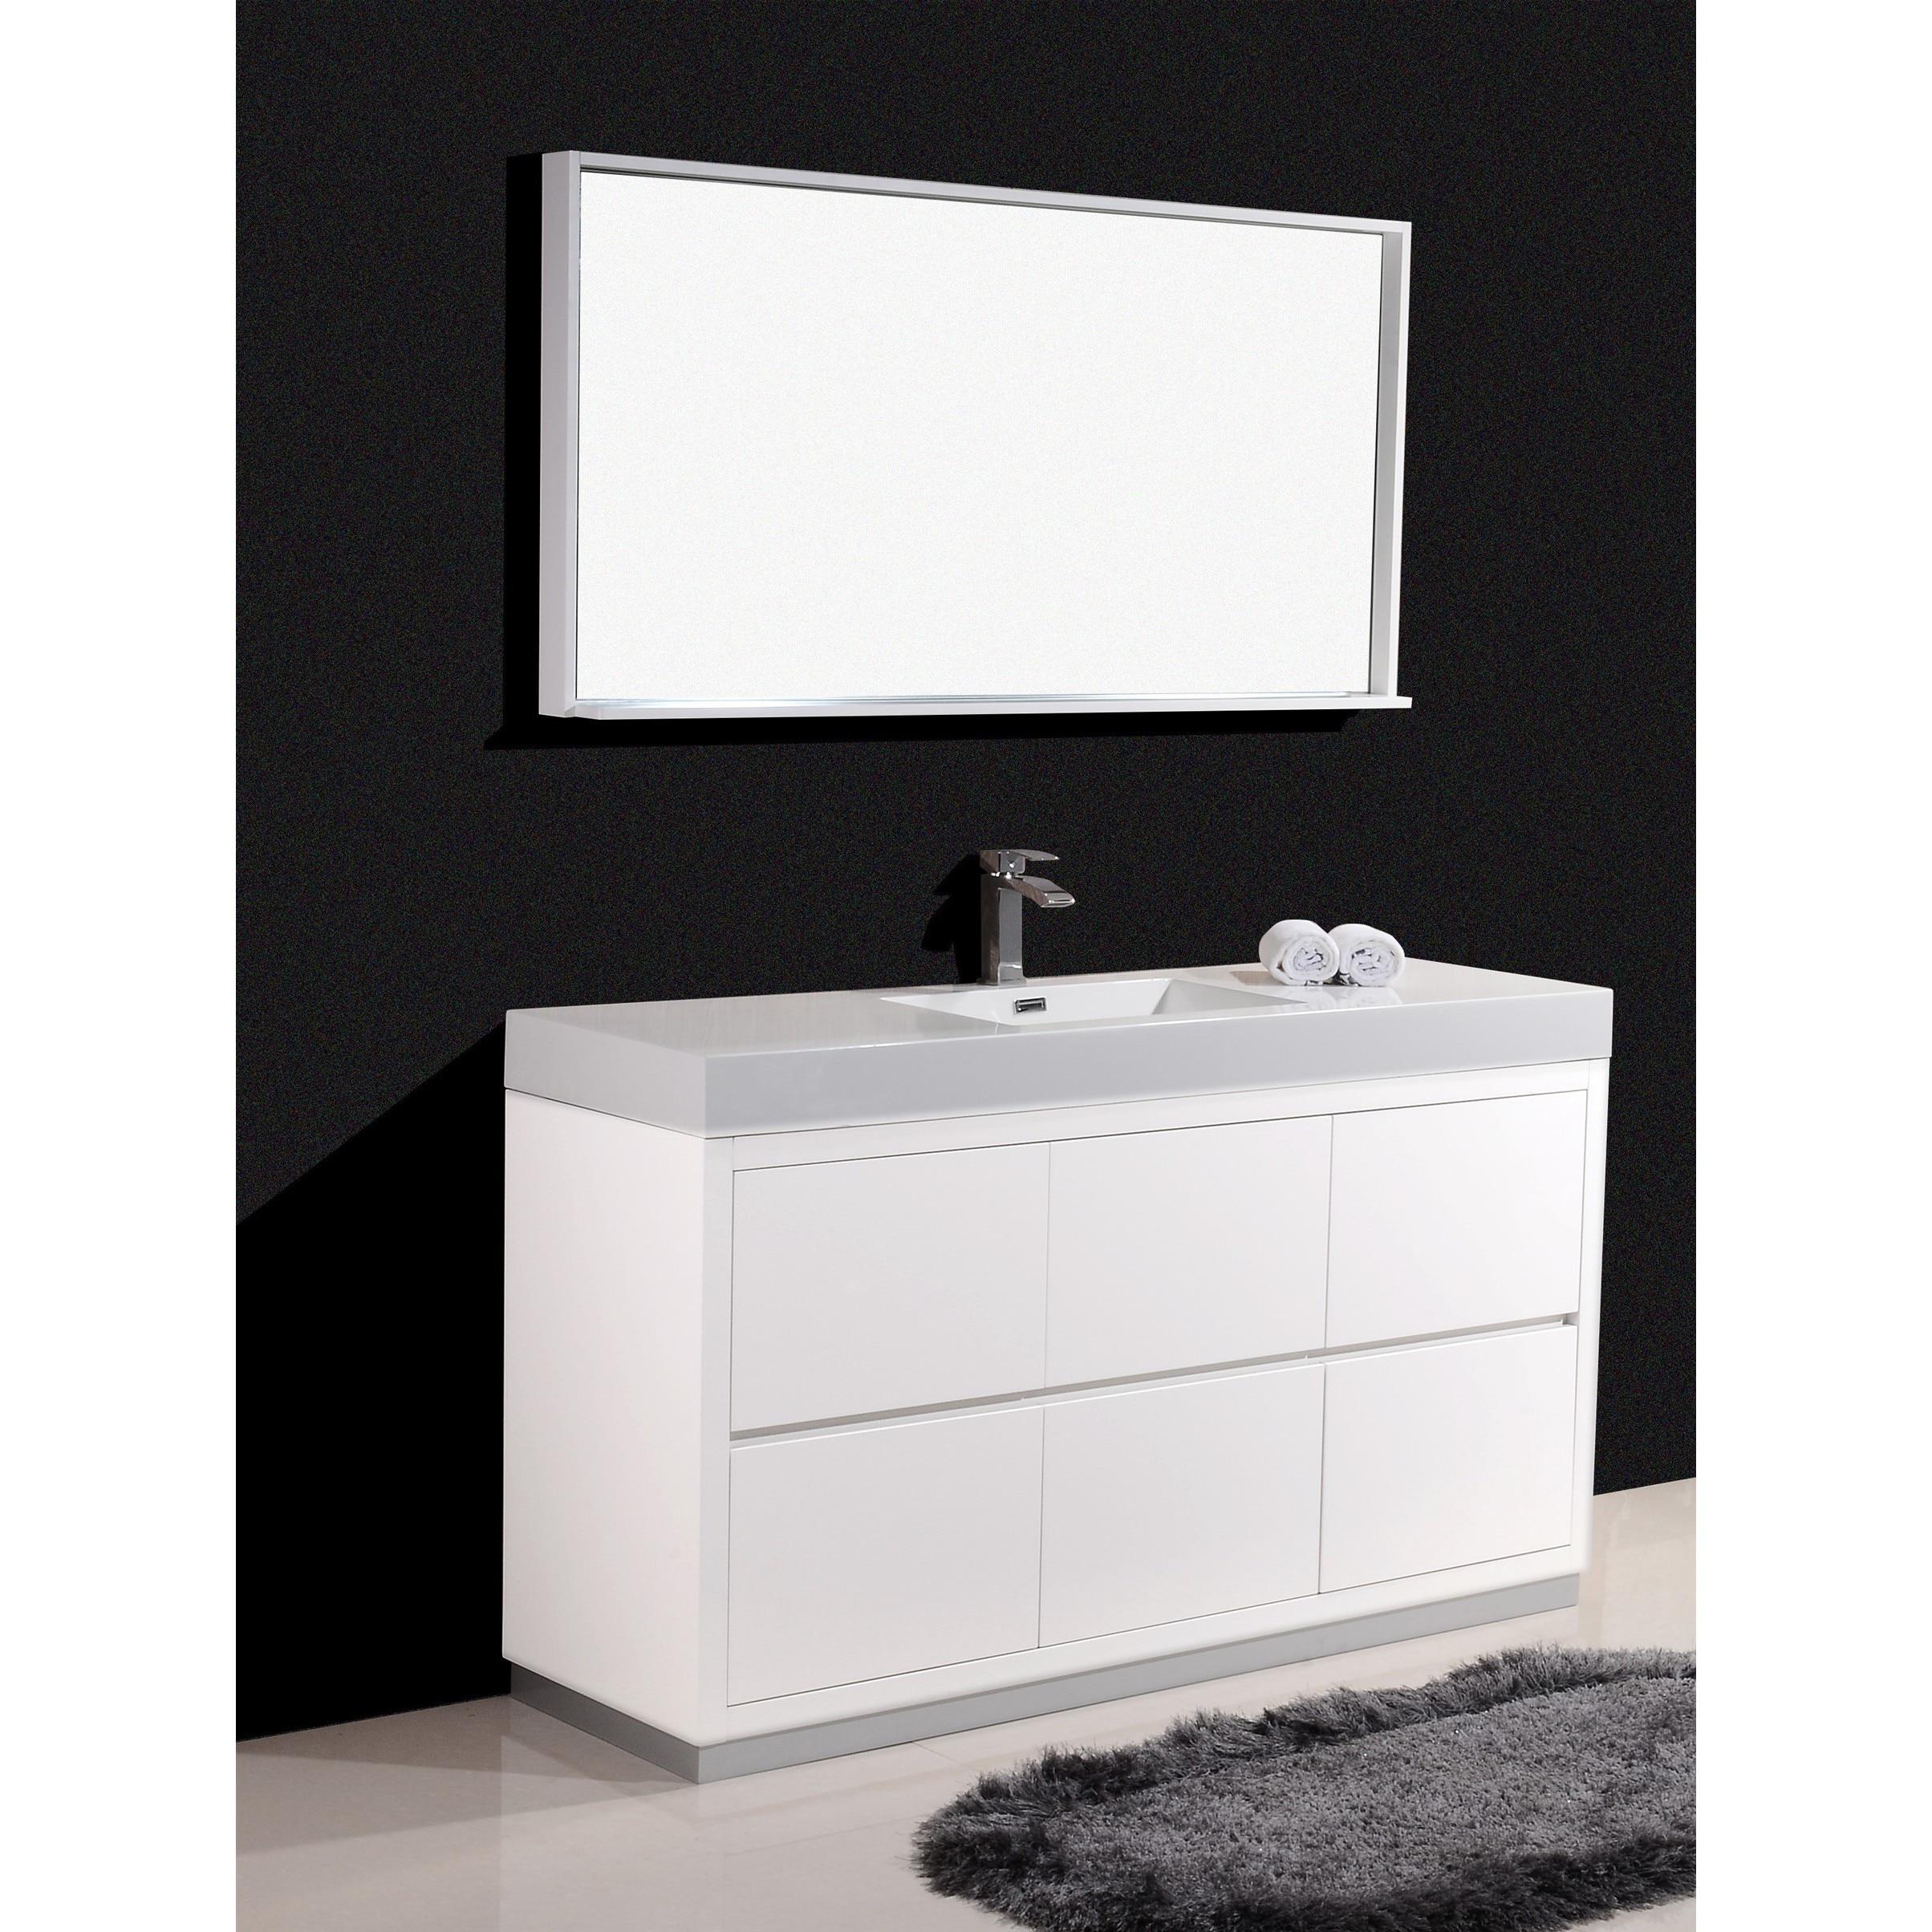 KubeBath Bliss 59 Inch Single Sink Bathroom Vanity (3 Options Available)